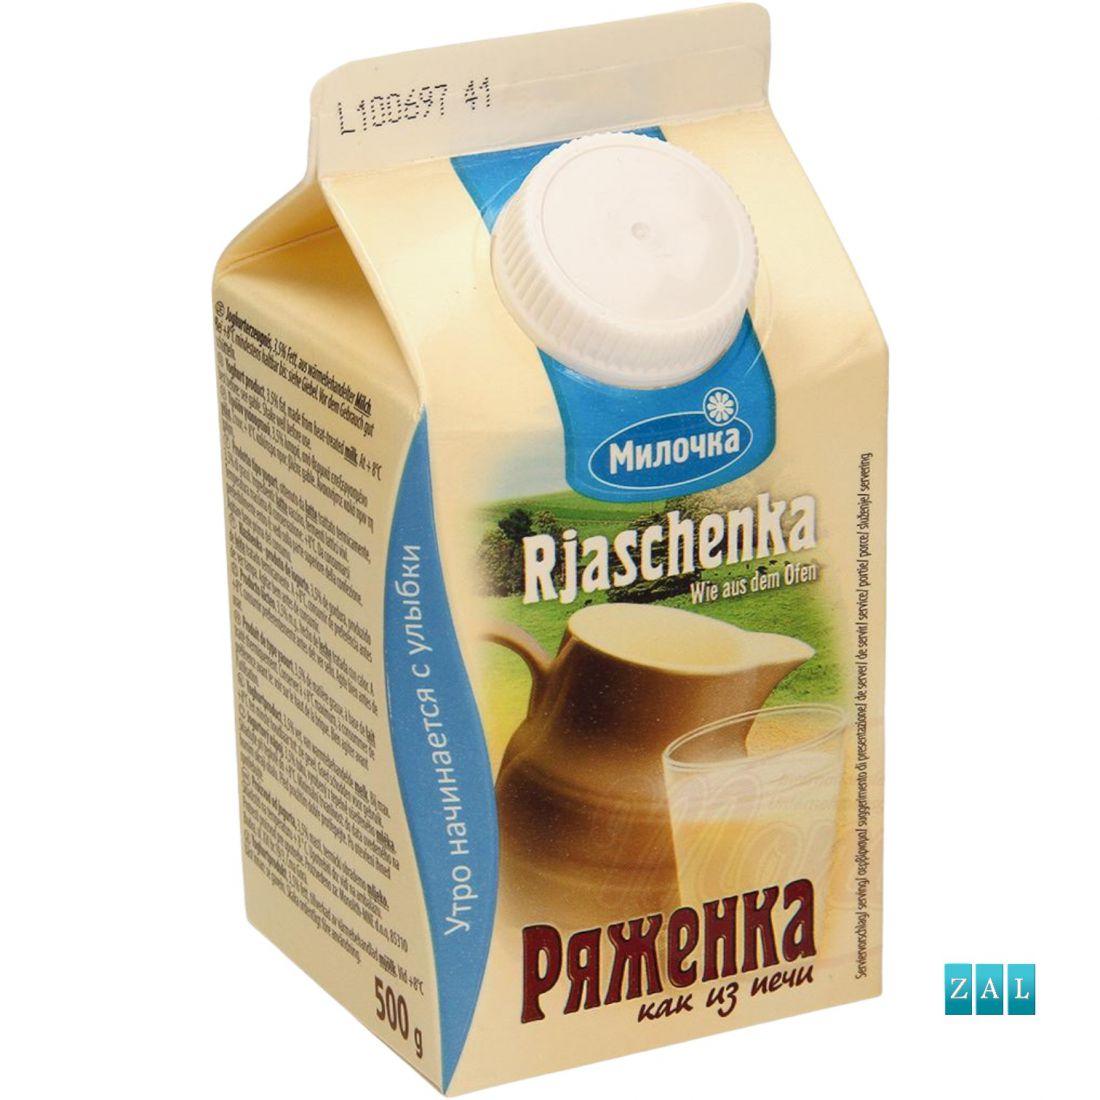 """Rjazsenka"" 3,5% zsírt. kemencében sült kefir 500g"